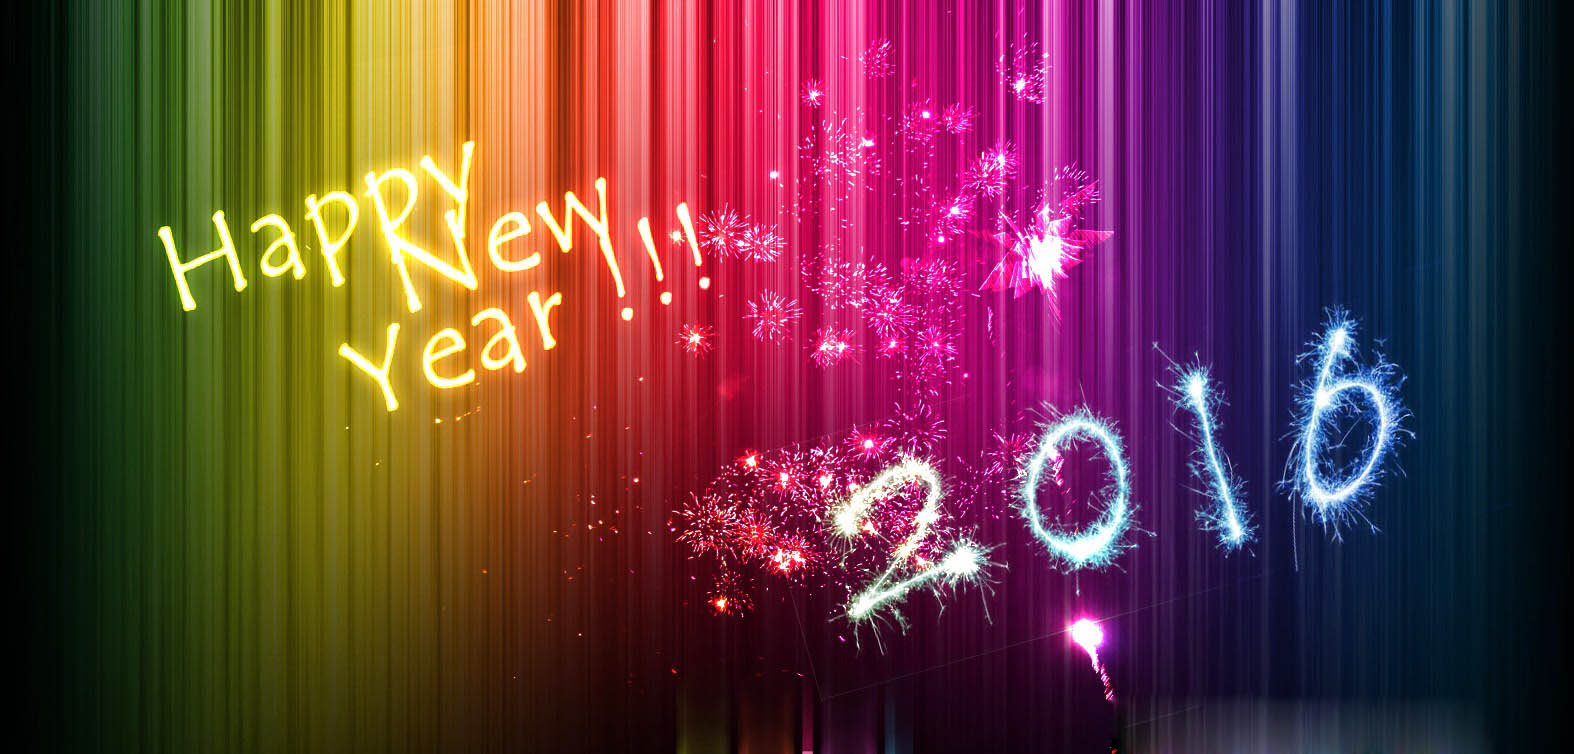 Happy New Year 2016 Images Happy New Year Images 2016 1574x754